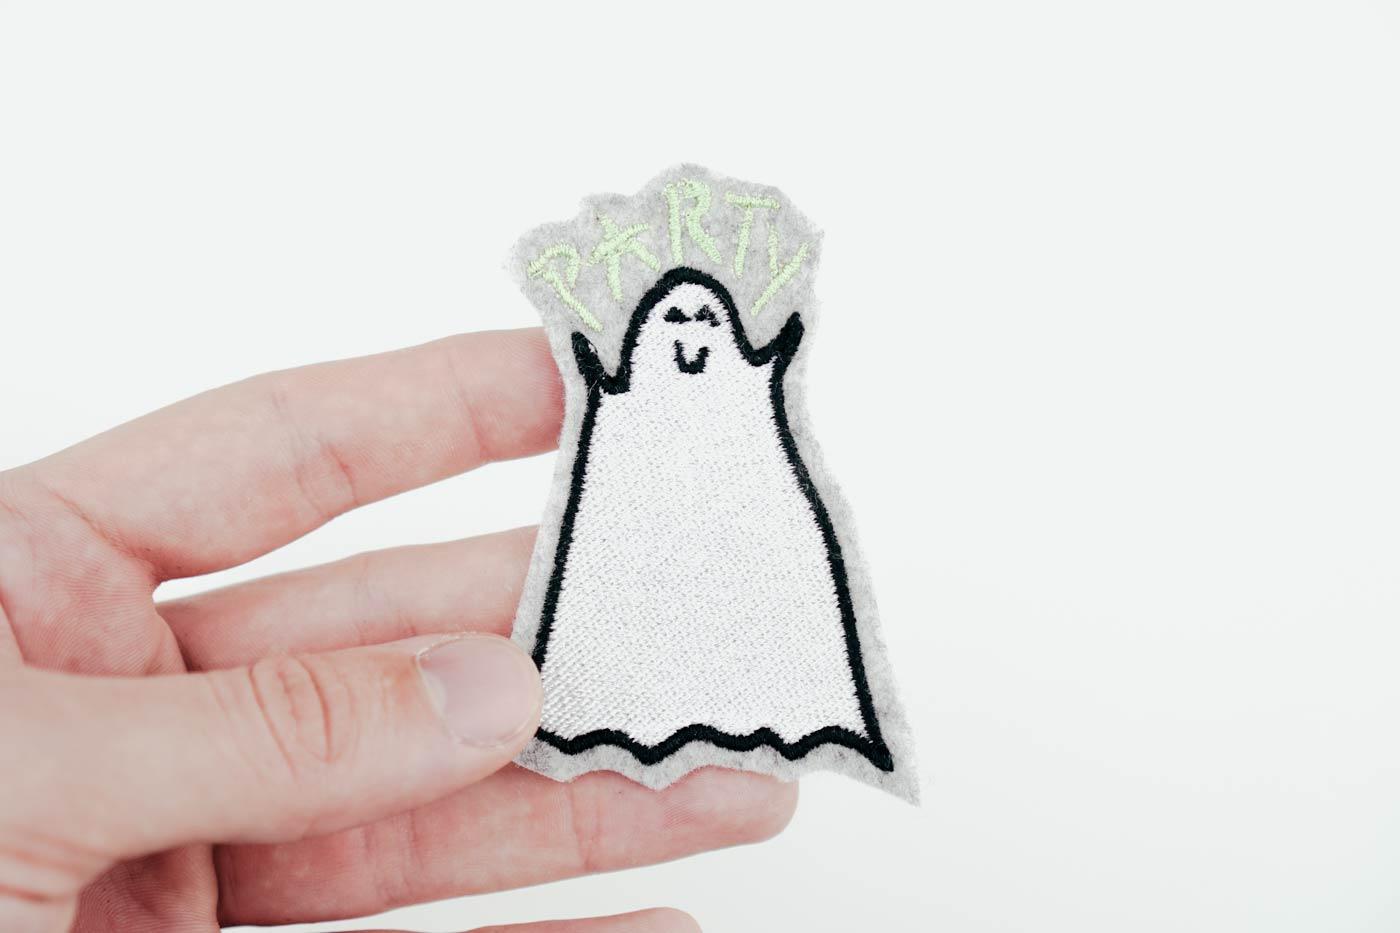 Stickdatei Gespenst stickdatei gespenst - 2017 09 stickdatei embroidery design halloween 01 00017 - Gespenst